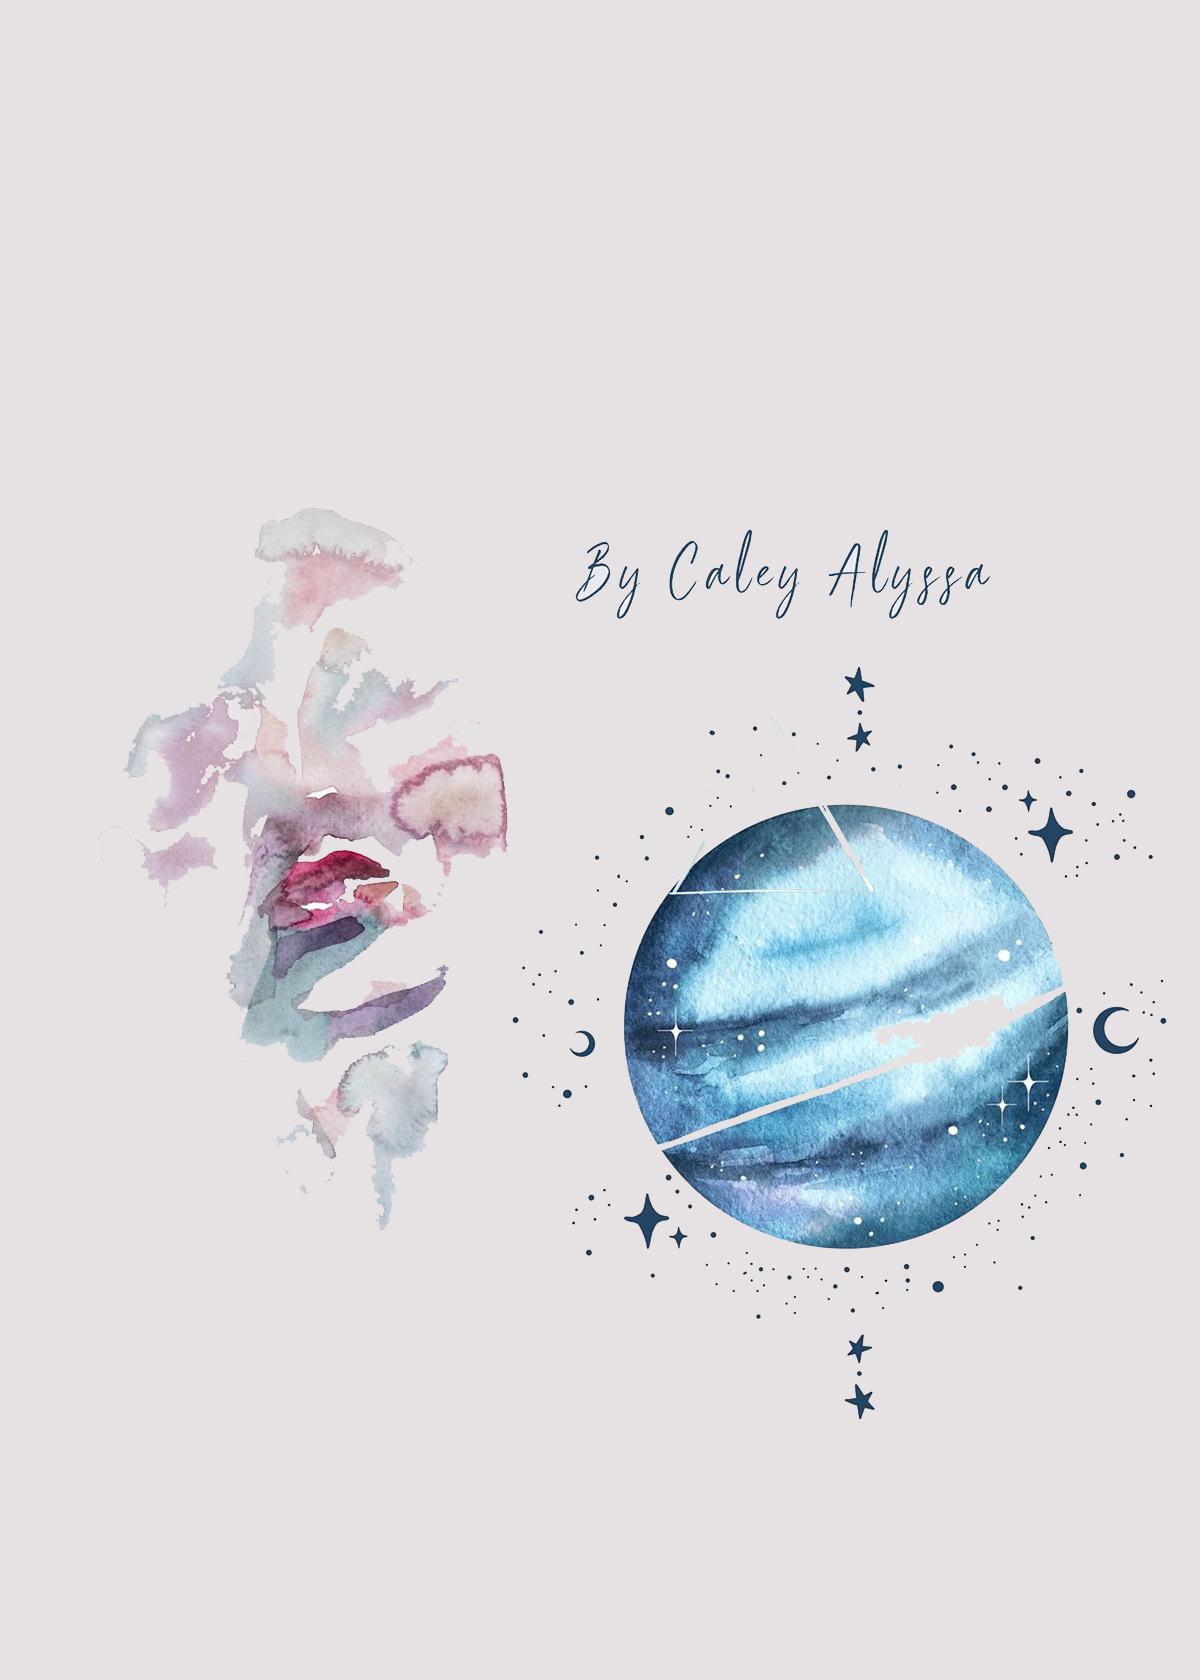 2020 New Moon Yoga Nidra Aquarius 17 Caley Alyssa